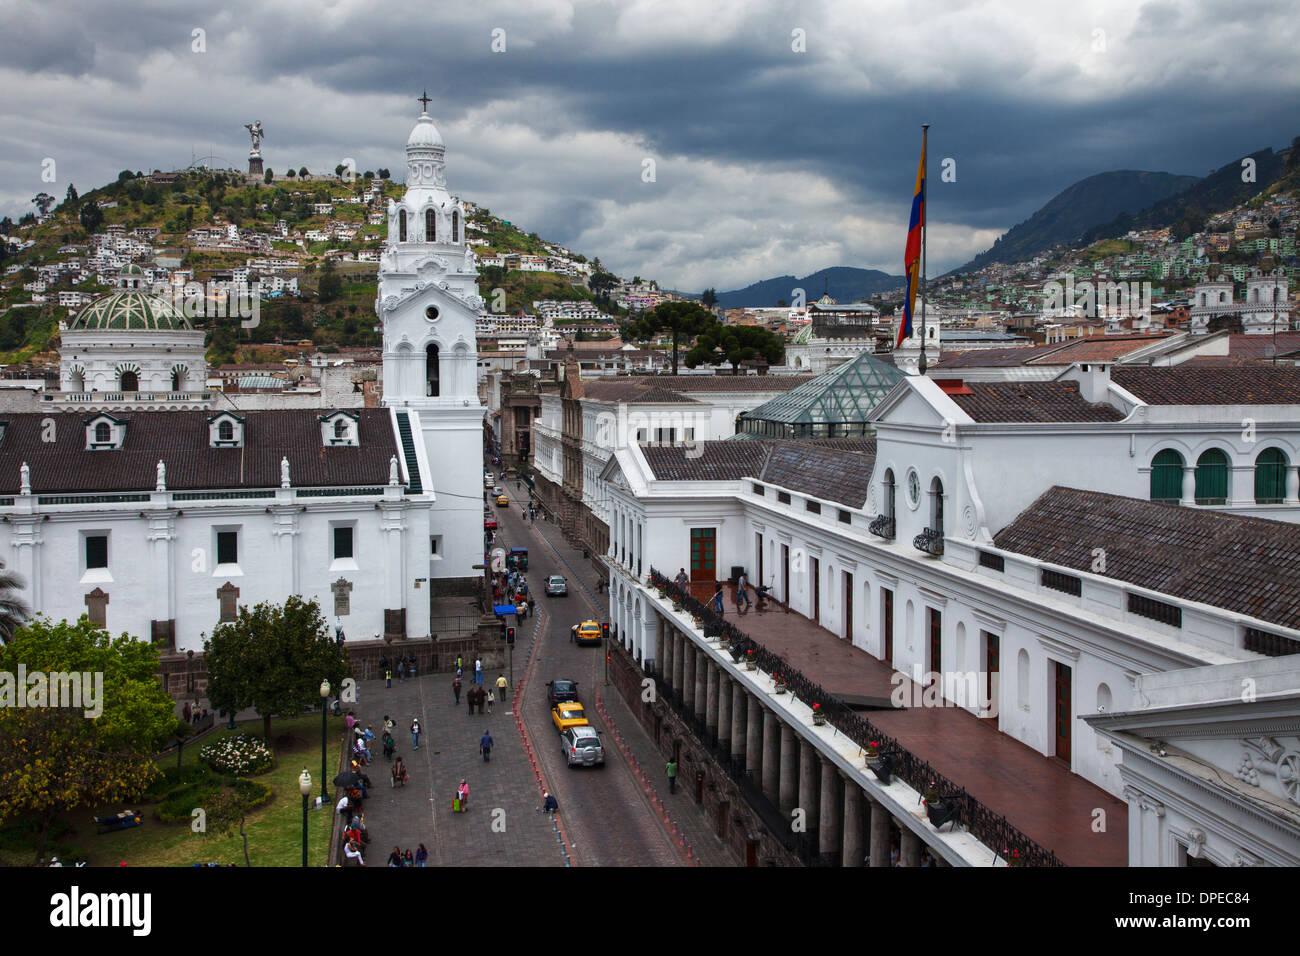 Cathedral of Quito looking towards Panecilllo Hill, Quito Ecuador - Stock Image